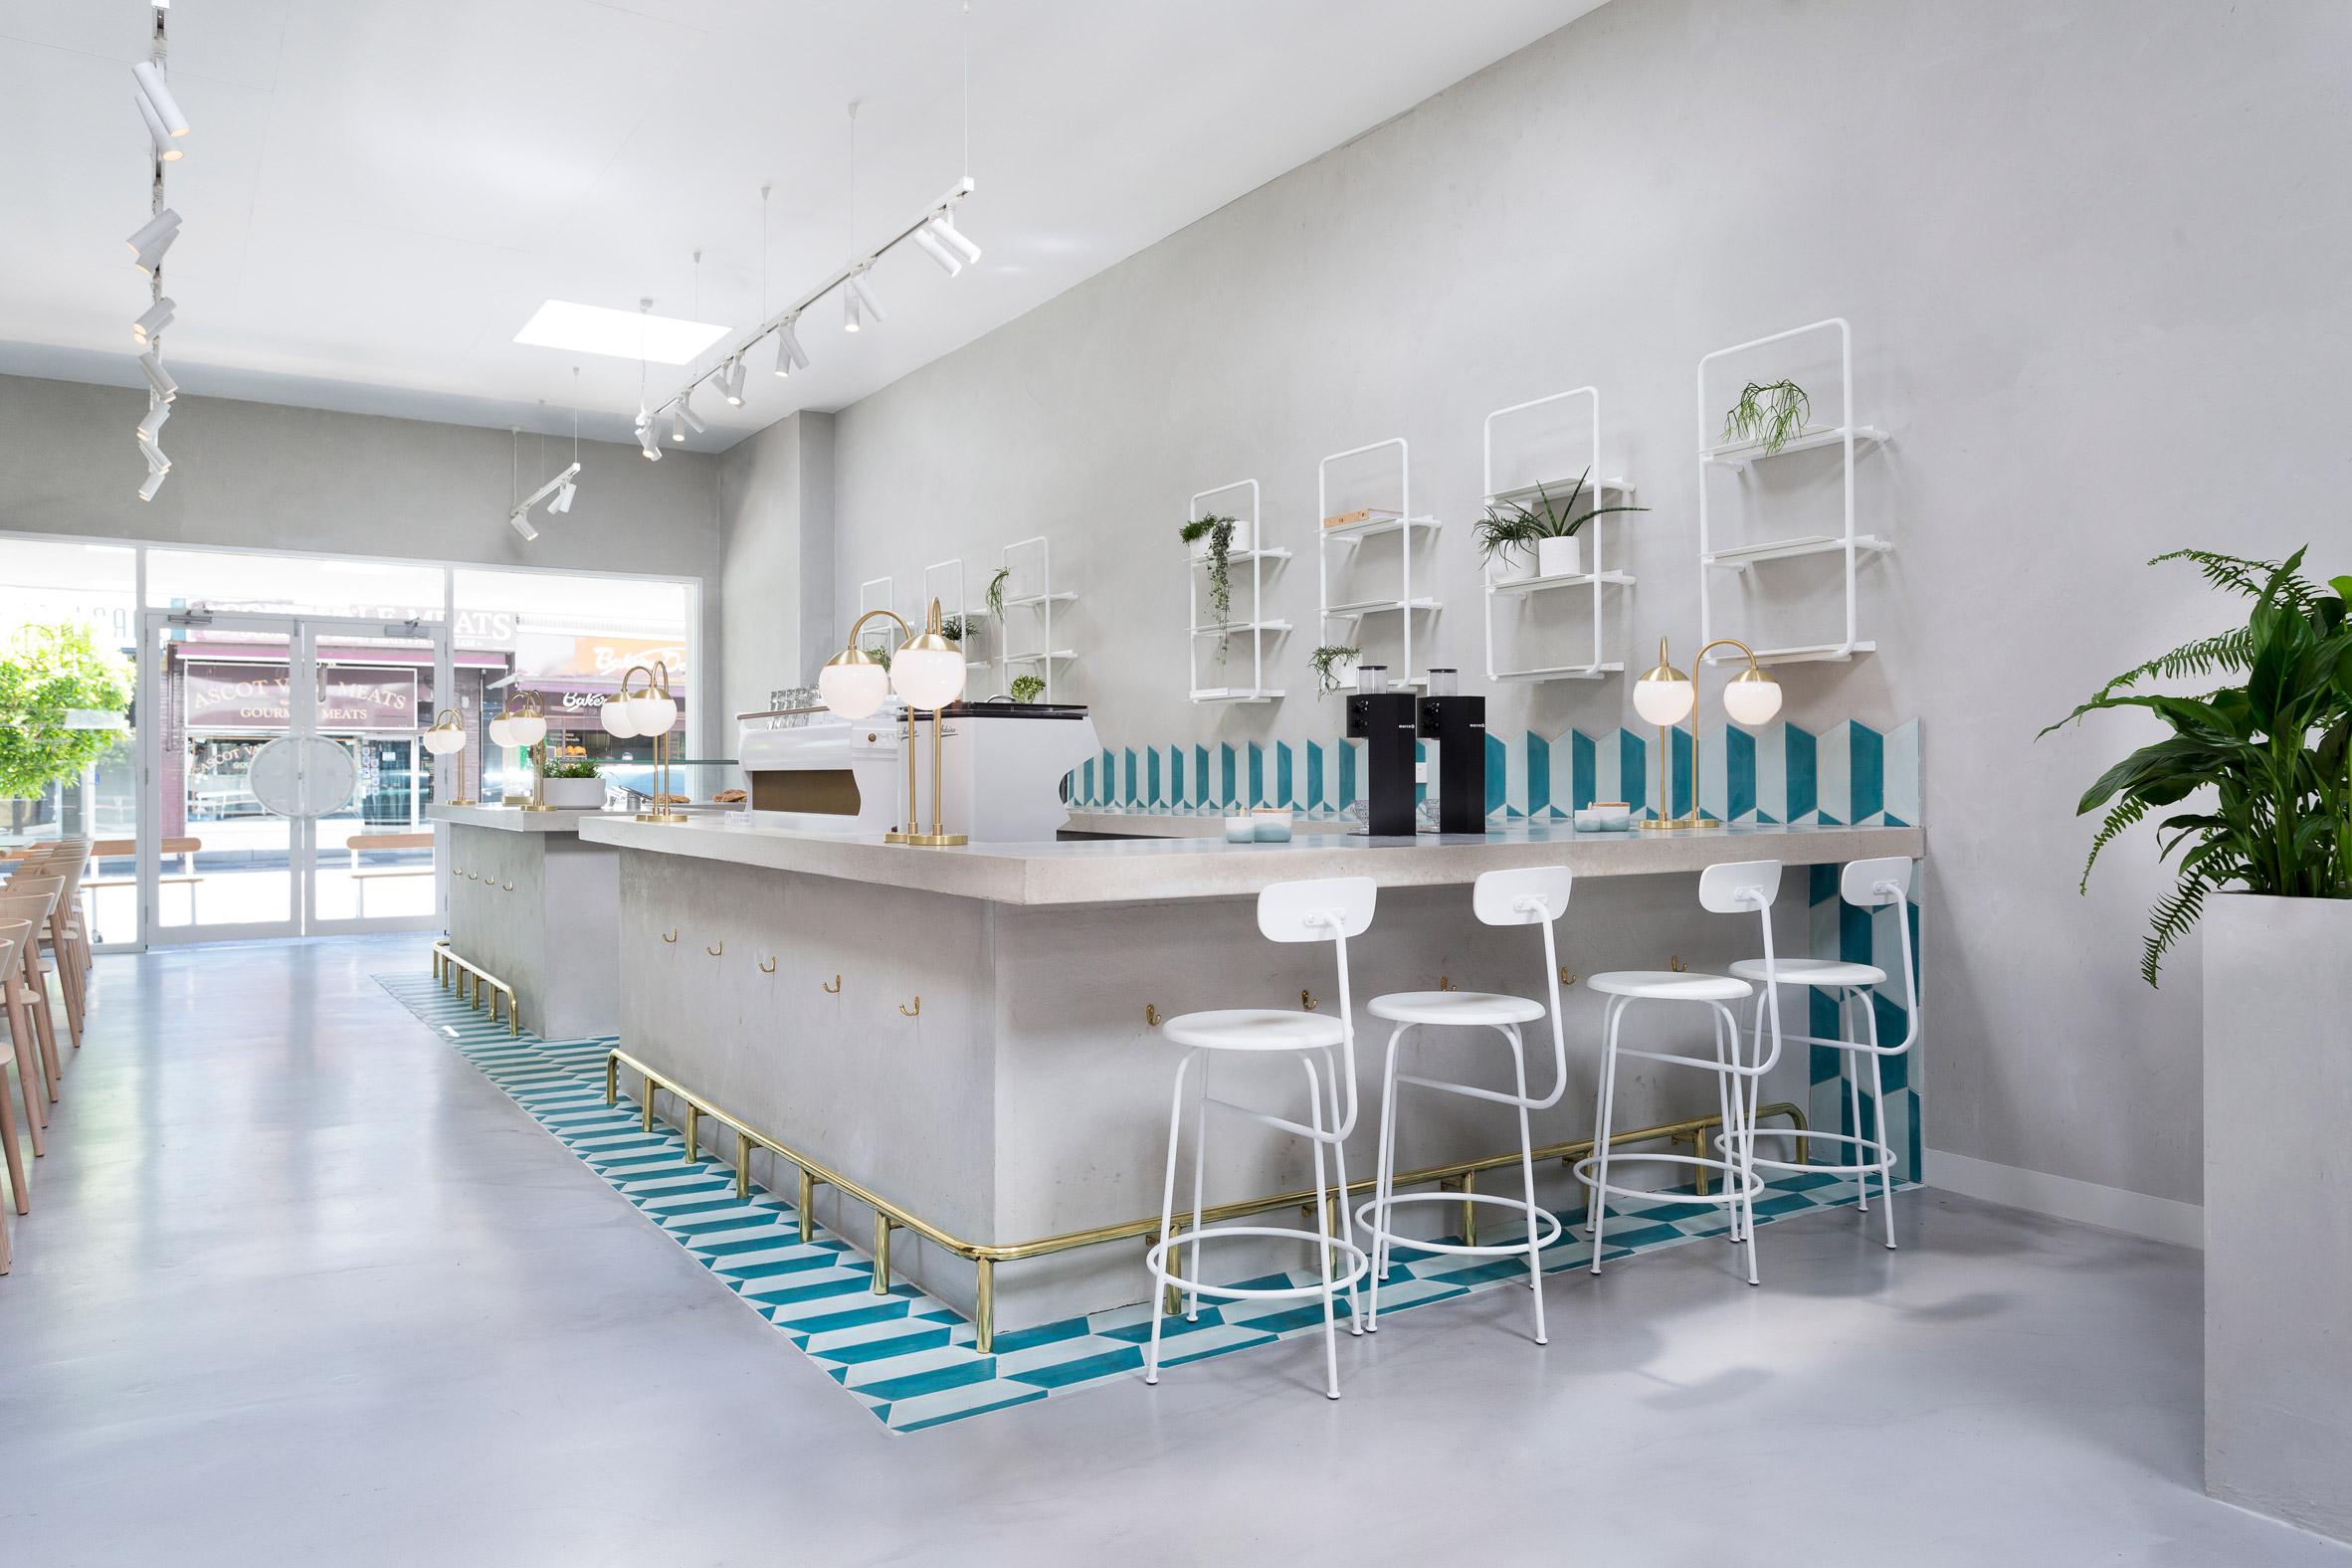 no-19-biasol-interiors-design-restaurant-australia_dezeen_2364_col_22